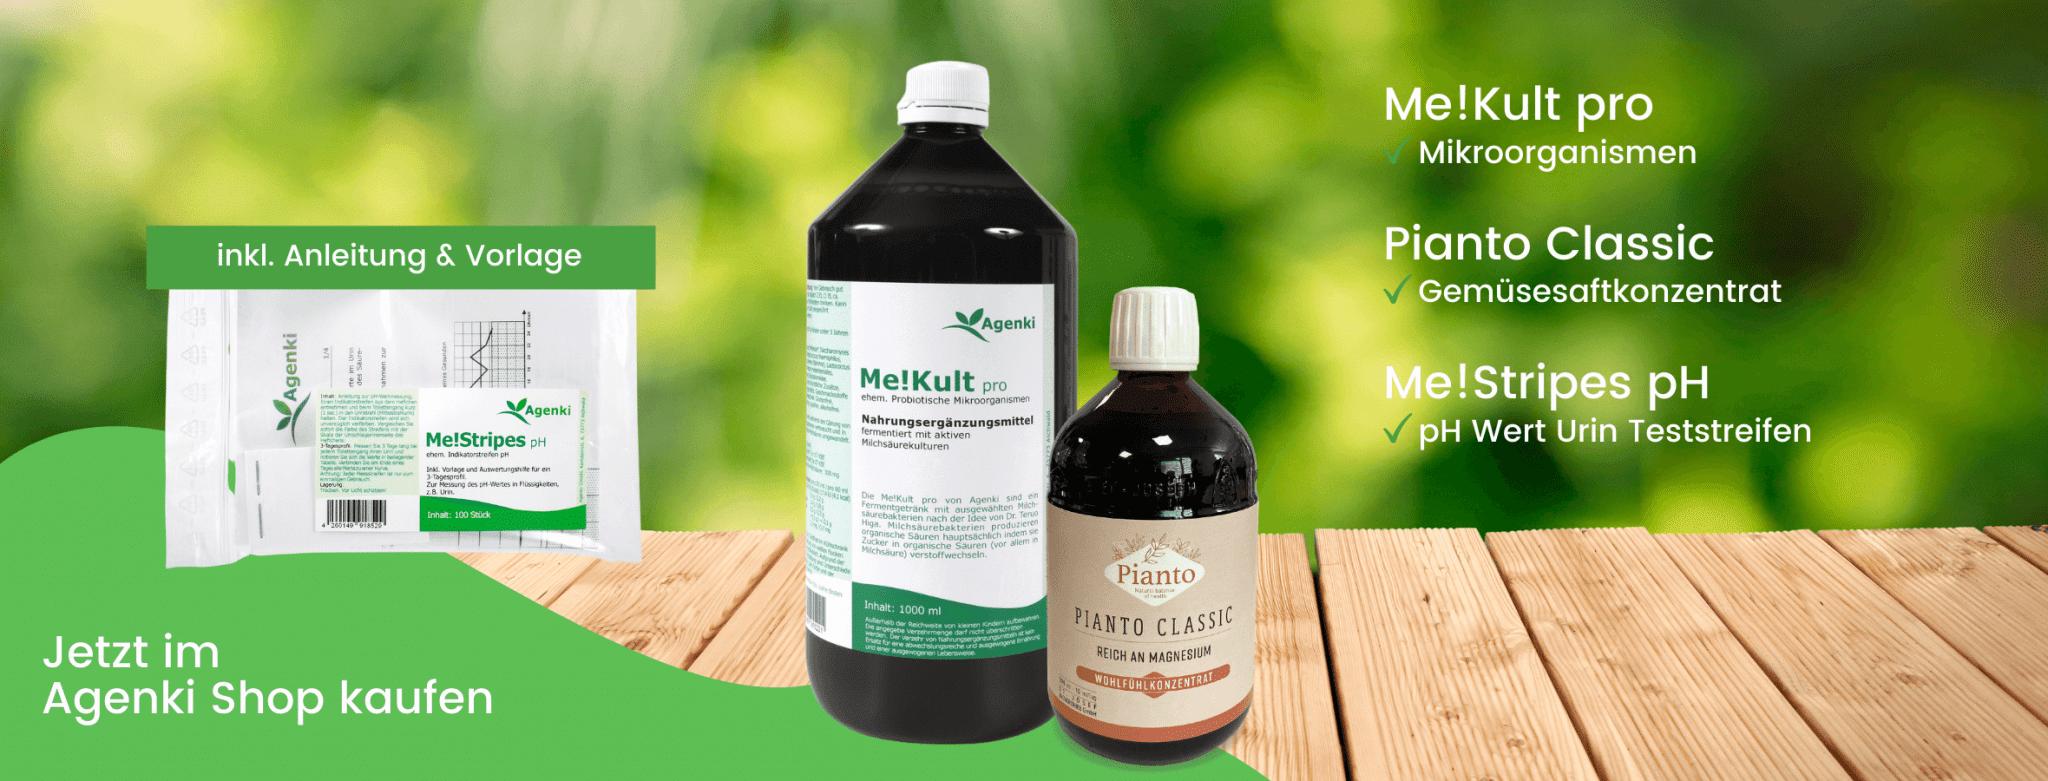 Me!Kult pro Mikroorganismen, Pianto Classic & Me!Stripes pH pH Wert Urin Teststreifen - Agenki